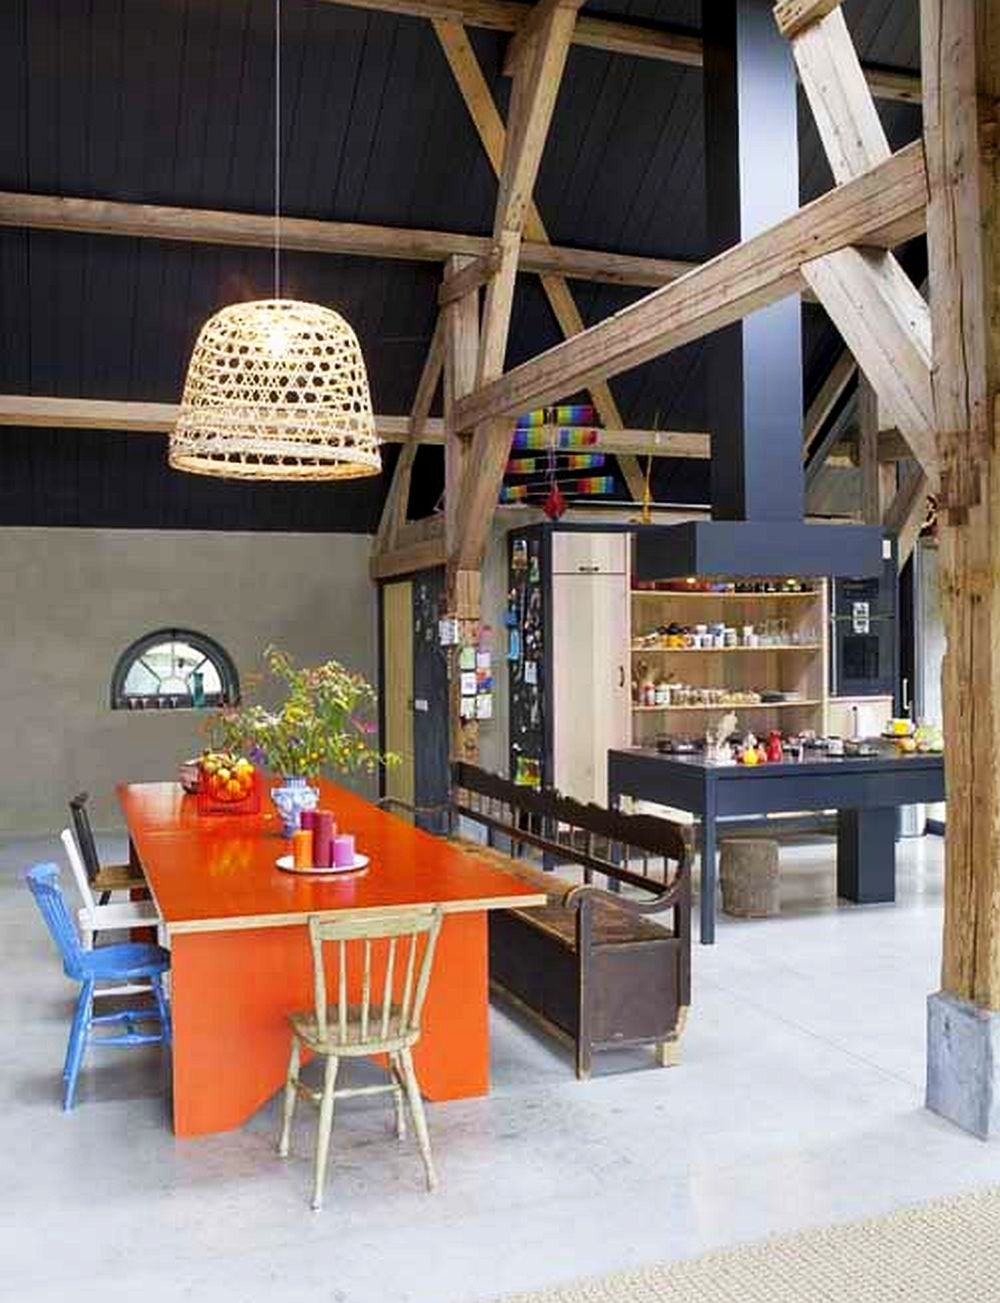 adelaparvu.com about modern farm, designer Larissa van Seumeren, Photo Viva Vida and Living Agency (40)